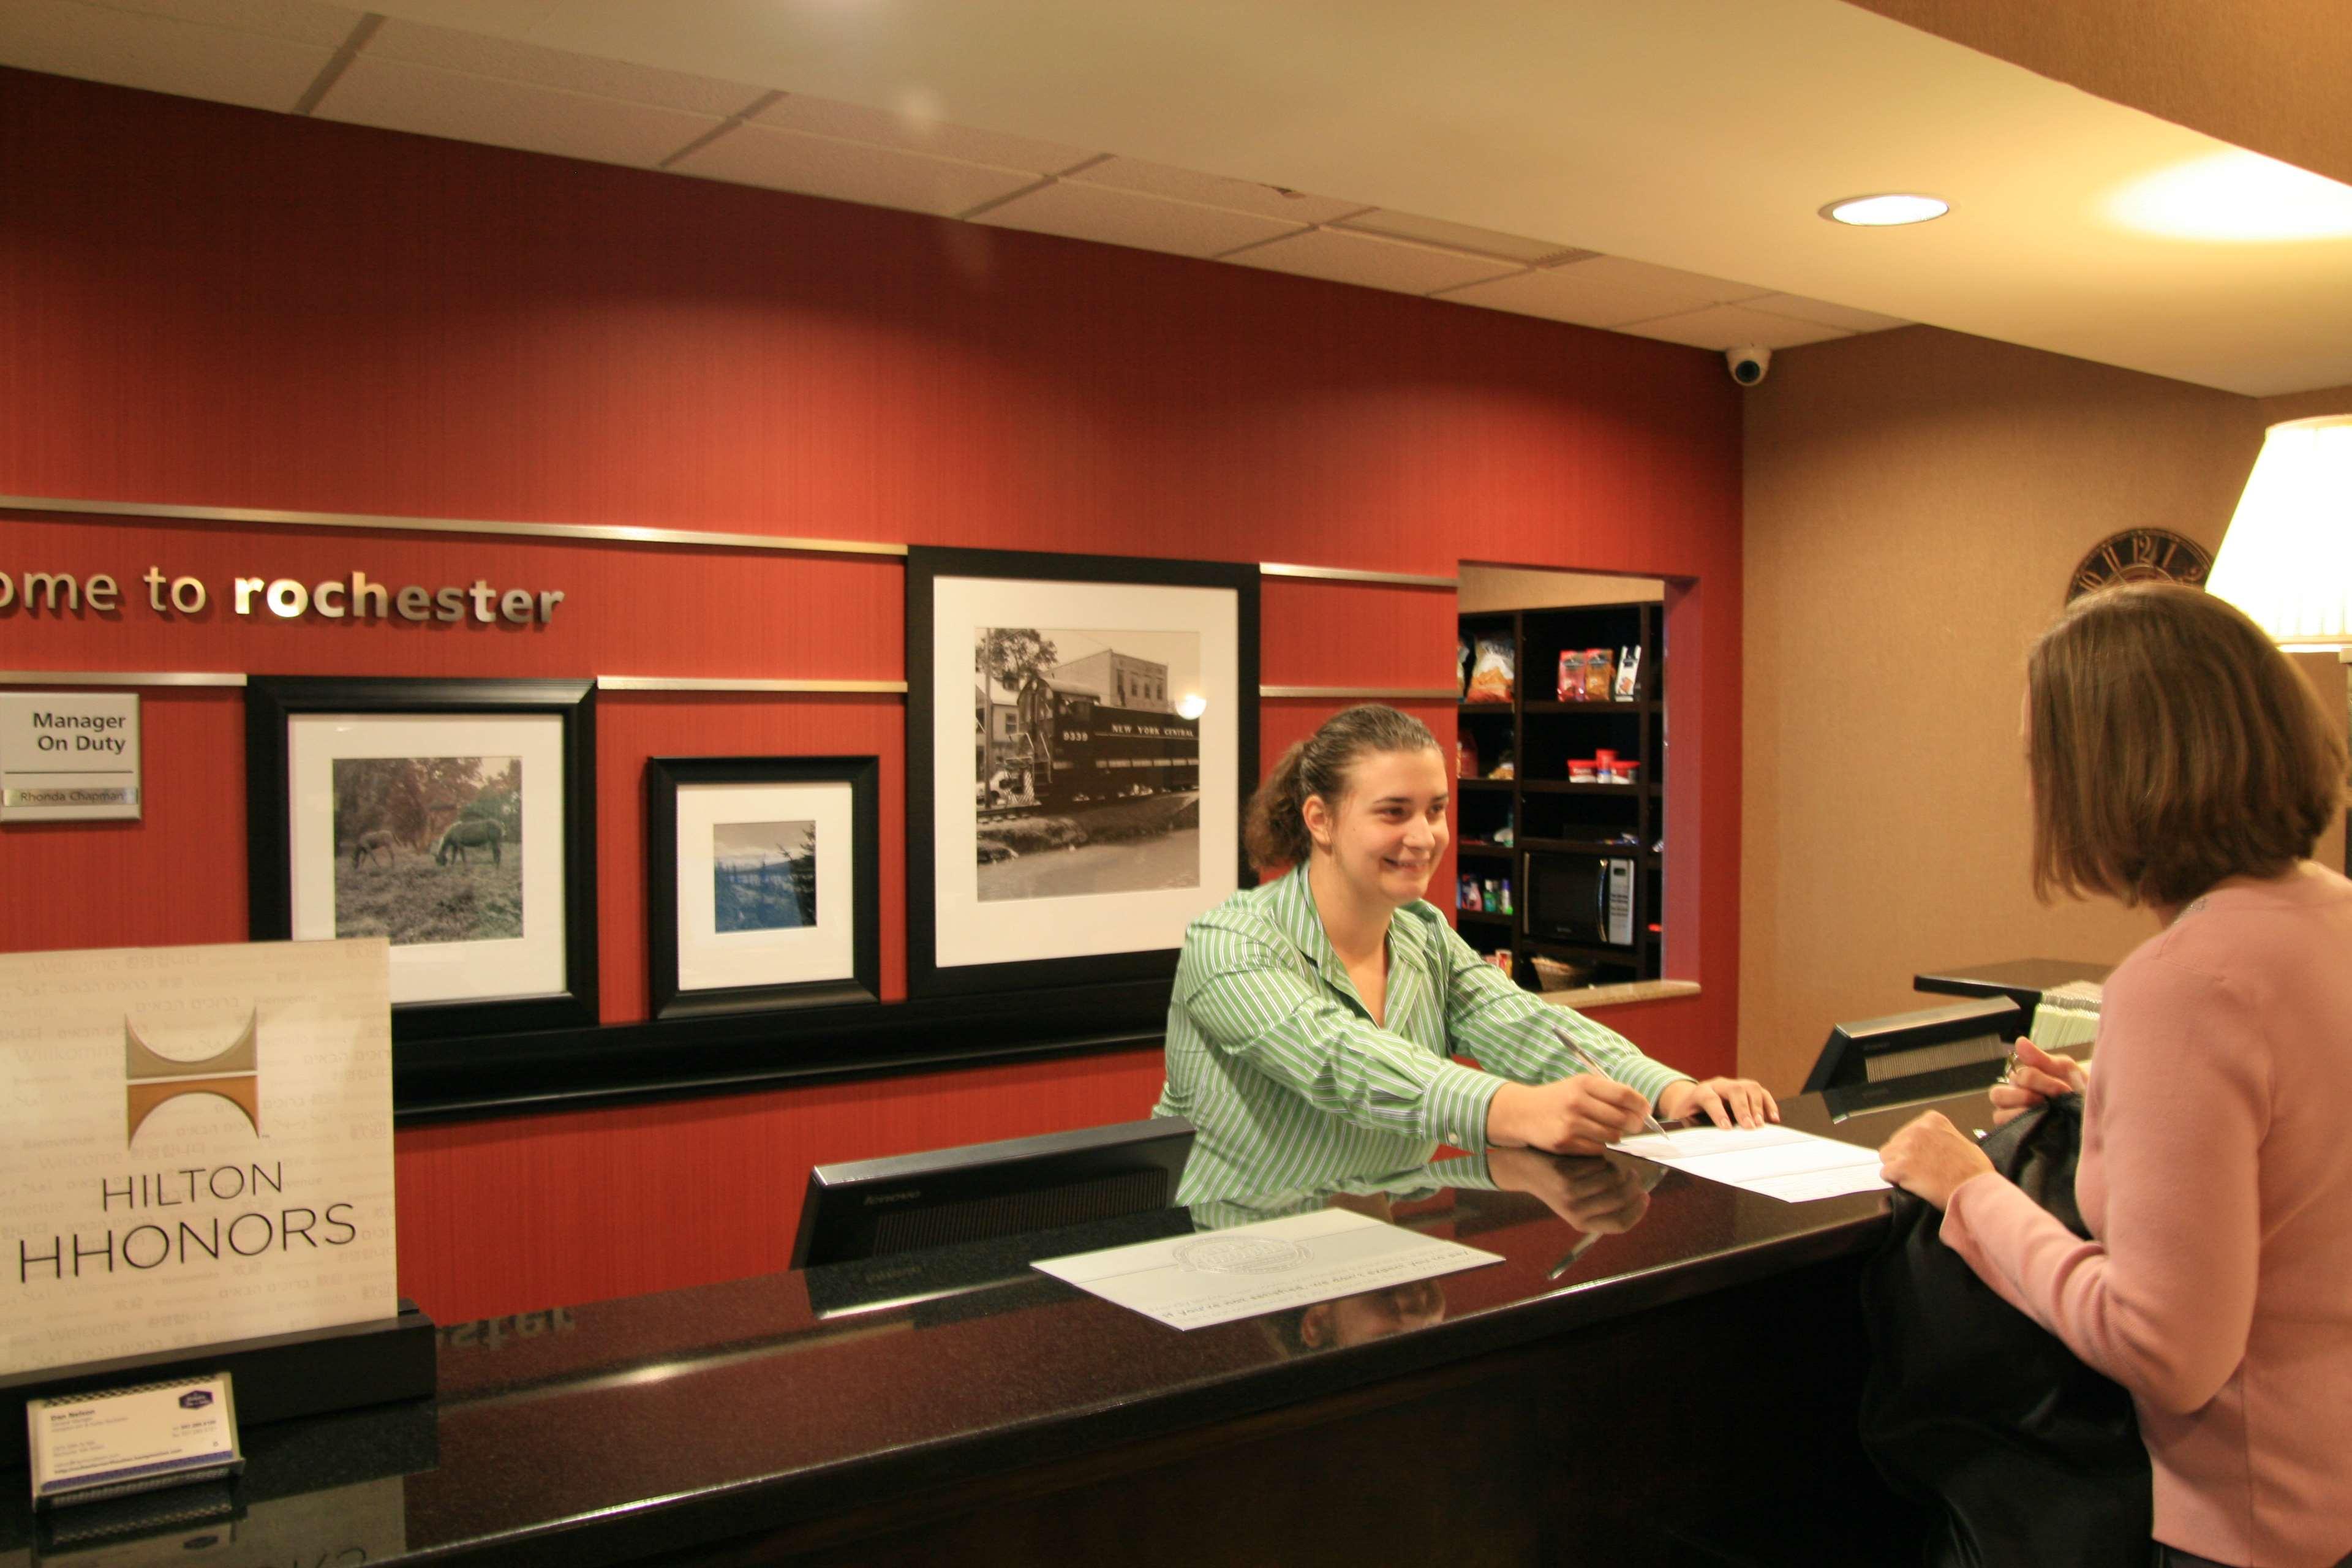 Hampton Inn & Suites Rochester-North image 6